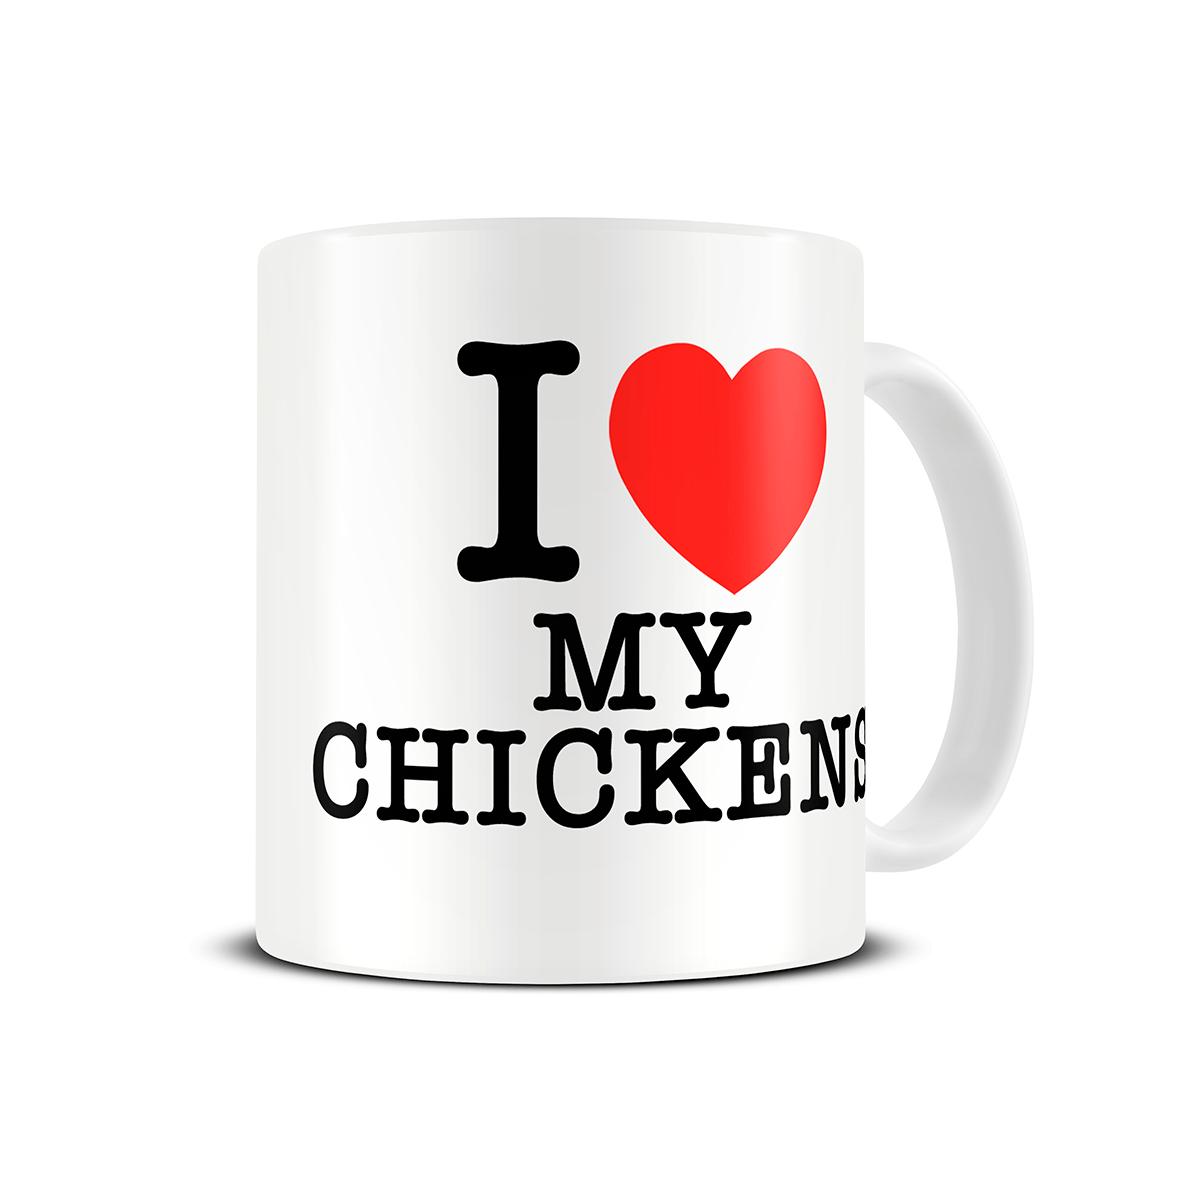 i-love-my-chickens-gift-mug